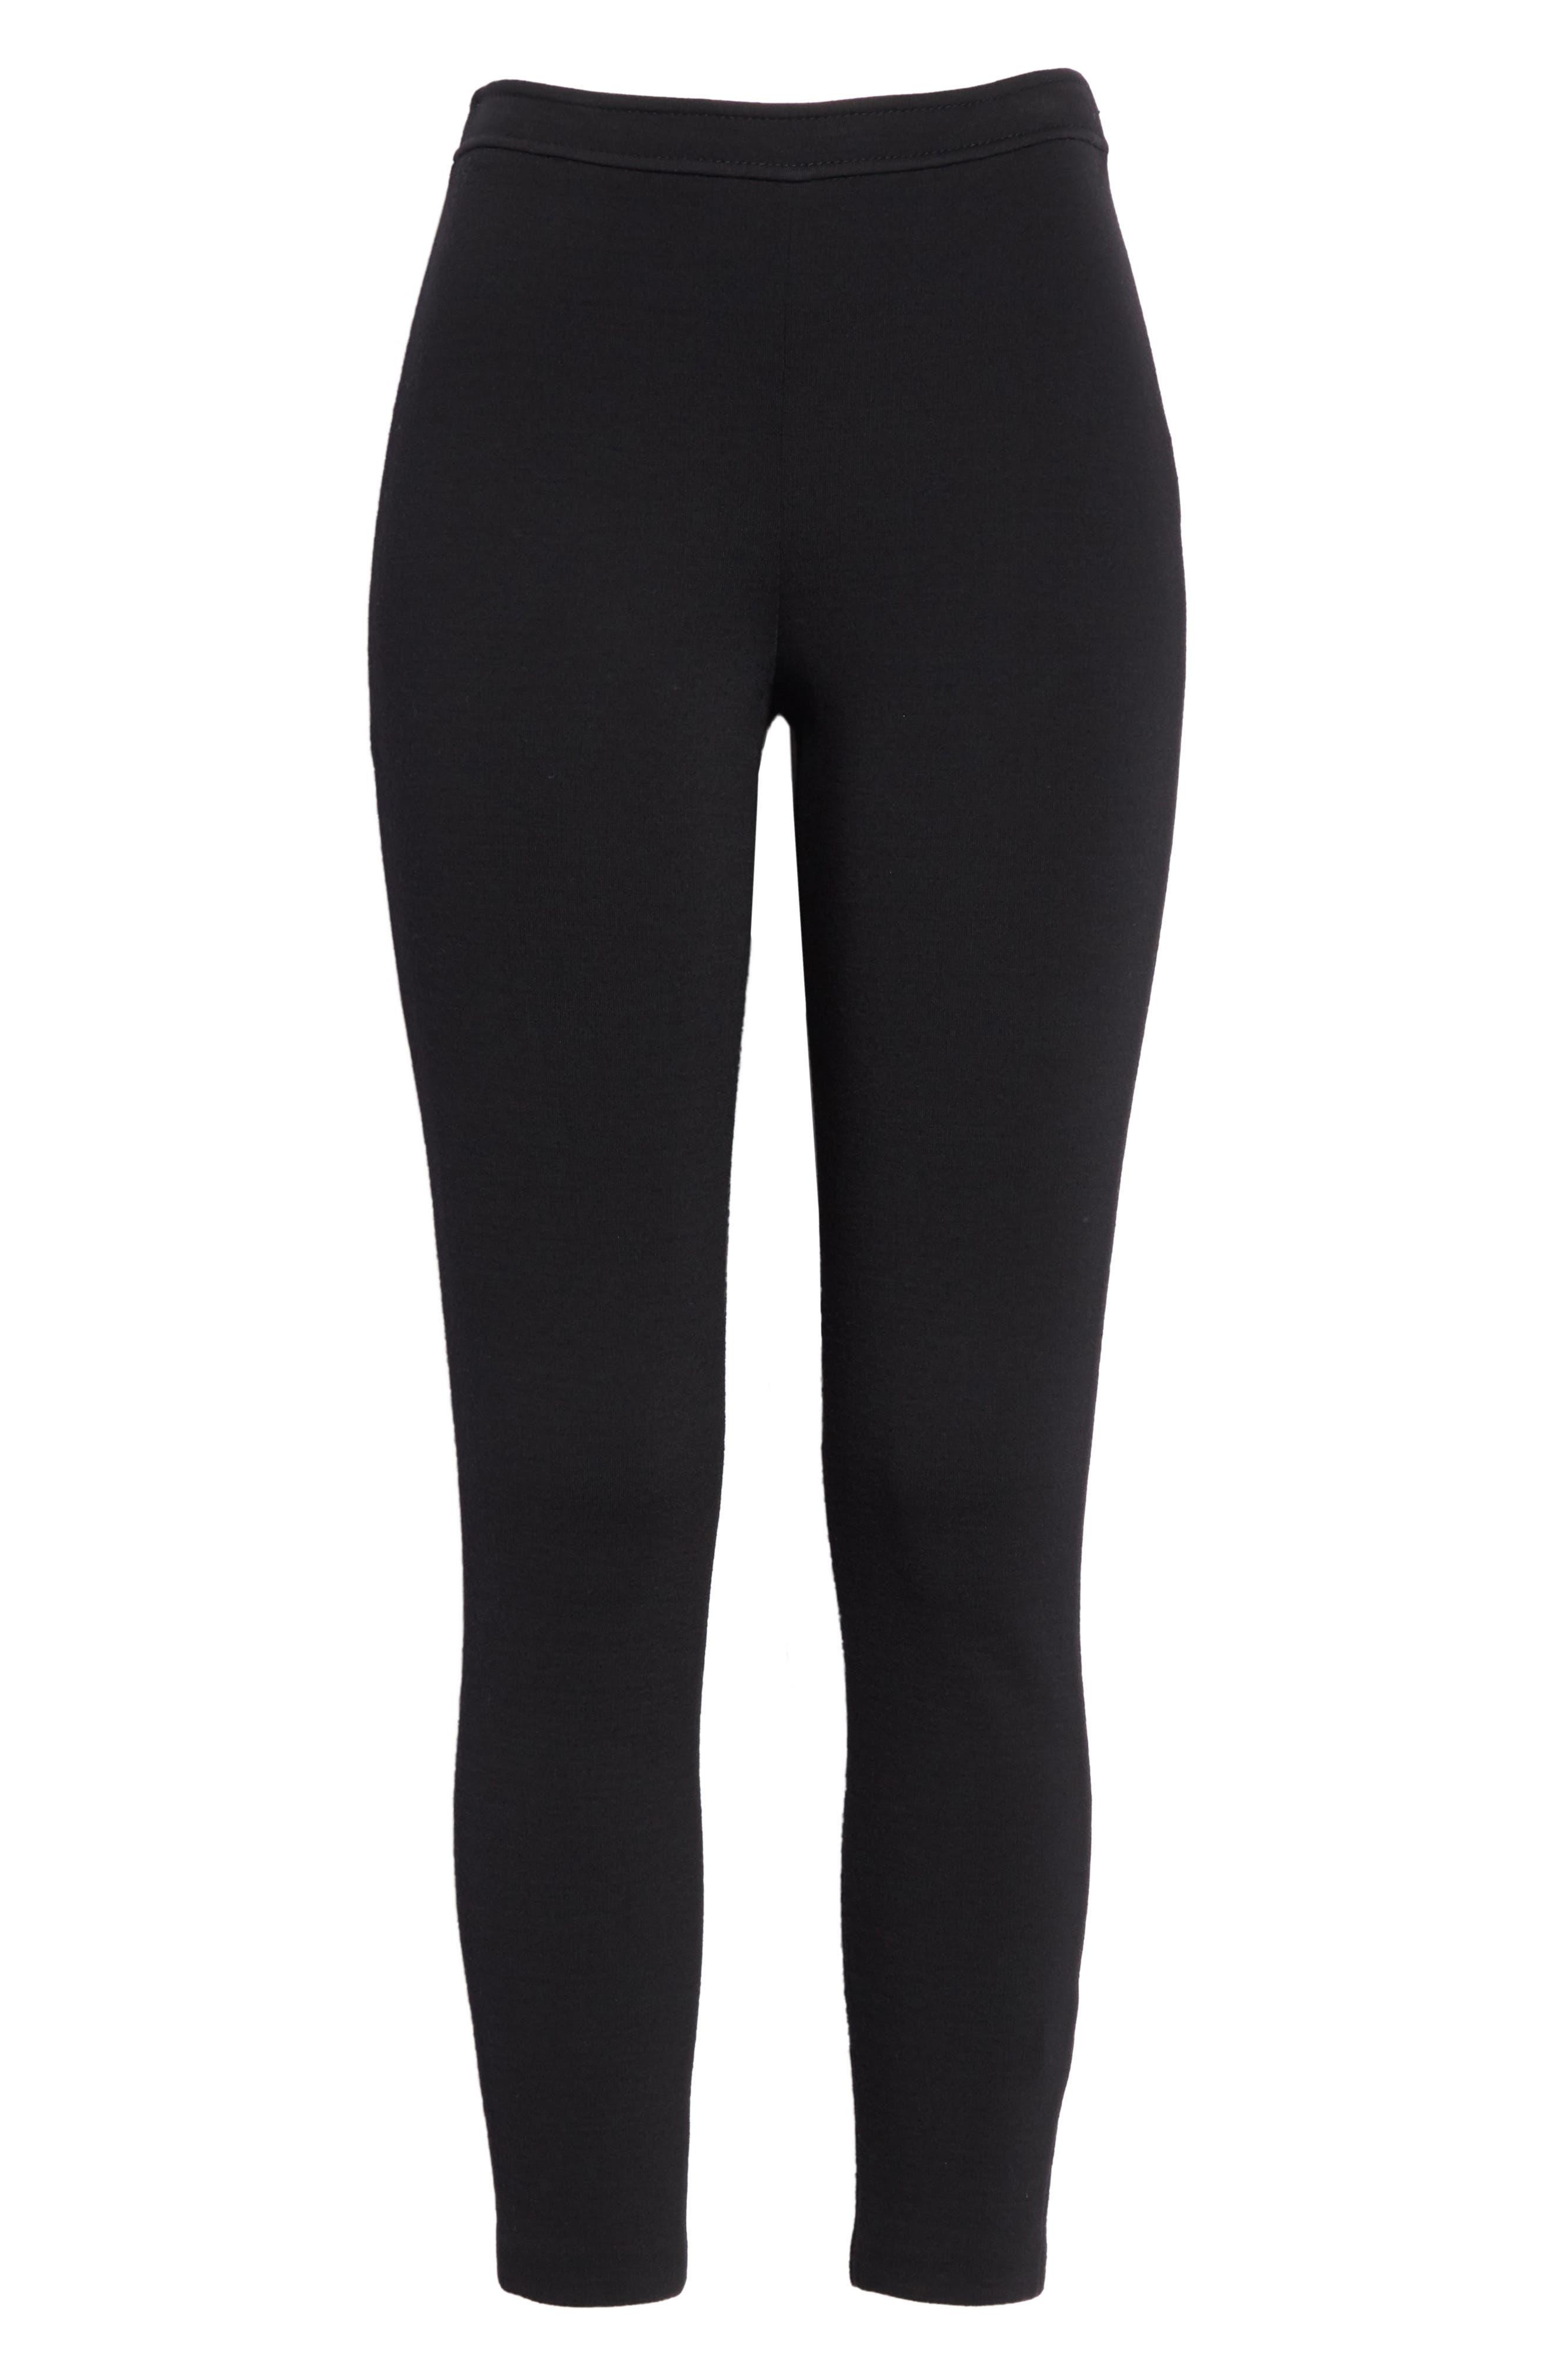 Alexa Milano Knit Pants,                             Alternate thumbnail 6, color,                             Caviar